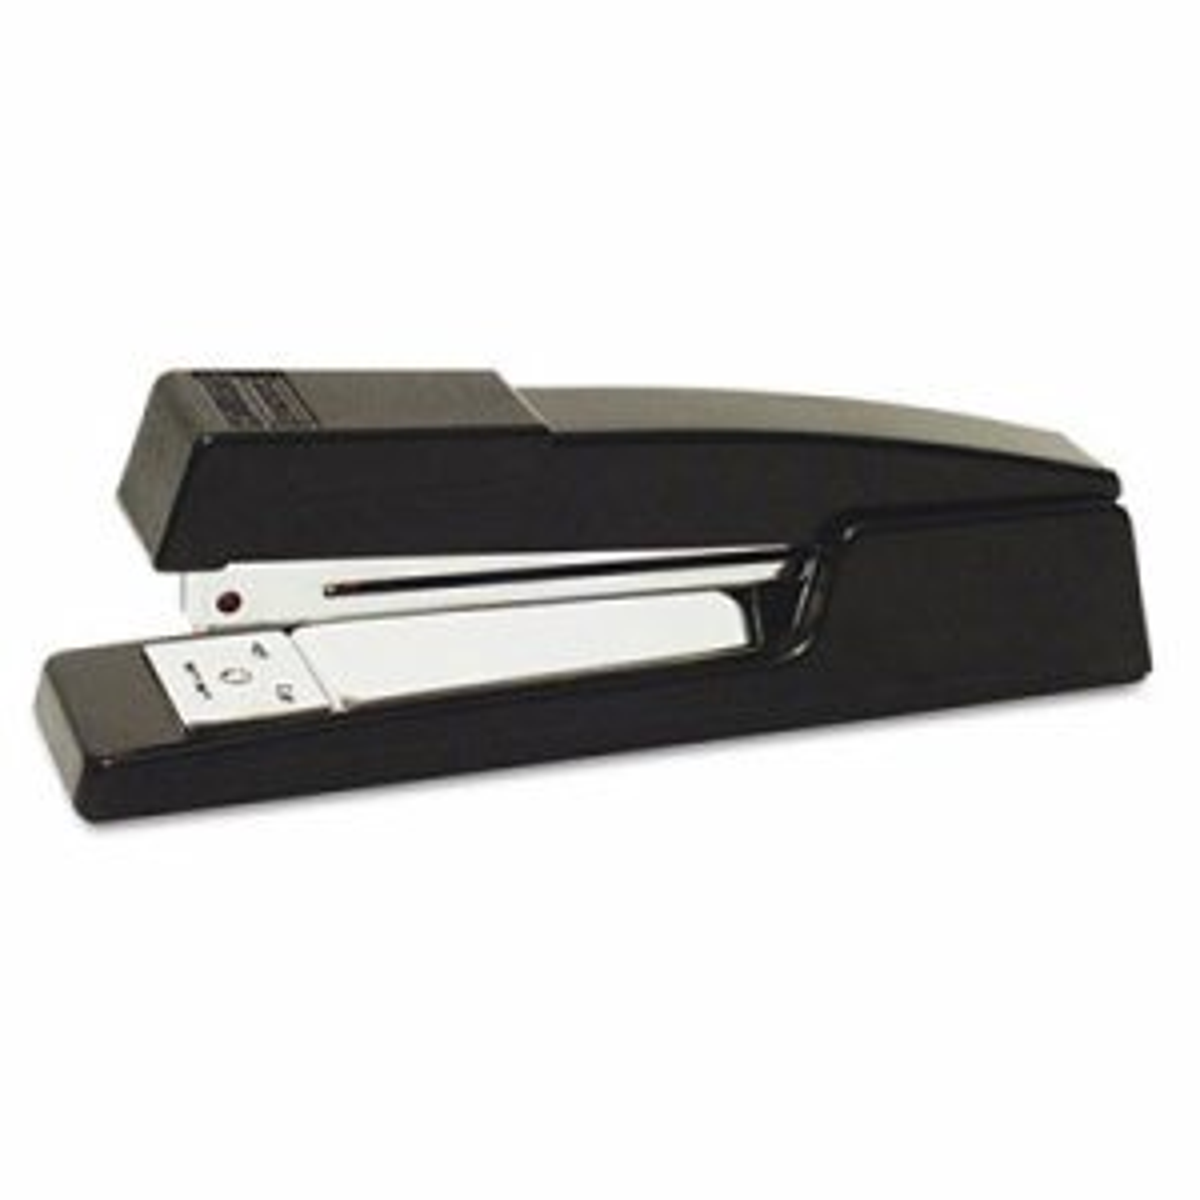 B440 Executive Full Strip Stapler, 20-Sheet Capacity, Black